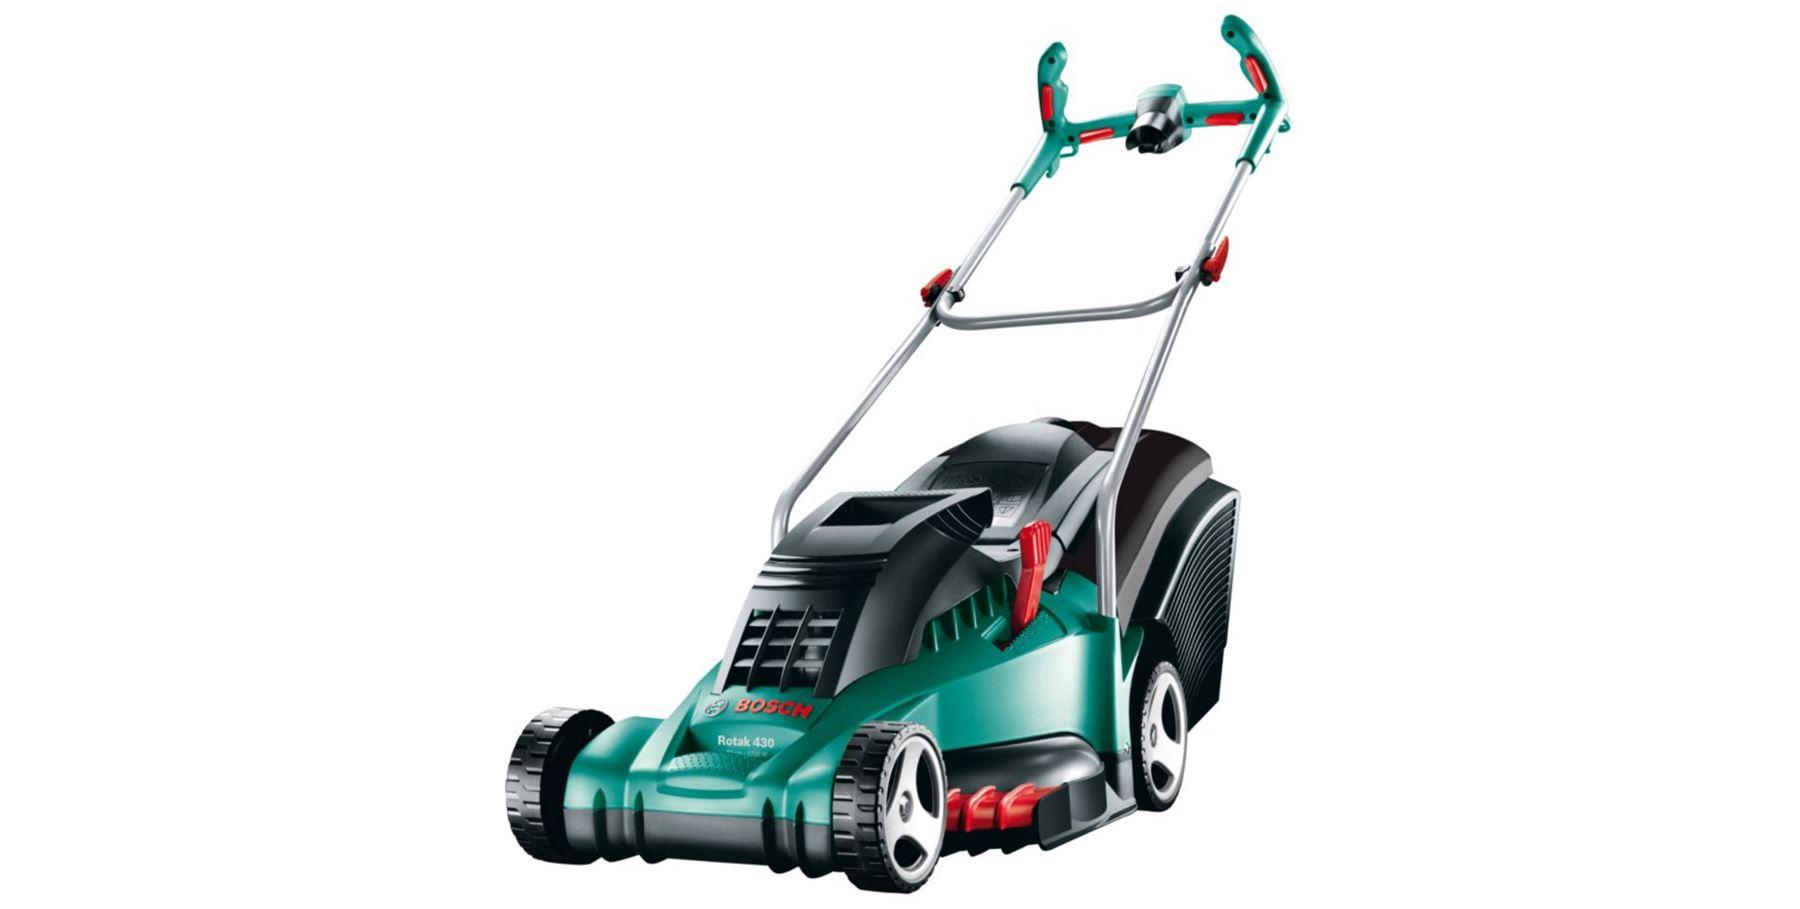 bosch rotak 370 er 430 er ergoflex electric corded rotary lawnmower trimmer ebay. Black Bedroom Furniture Sets. Home Design Ideas